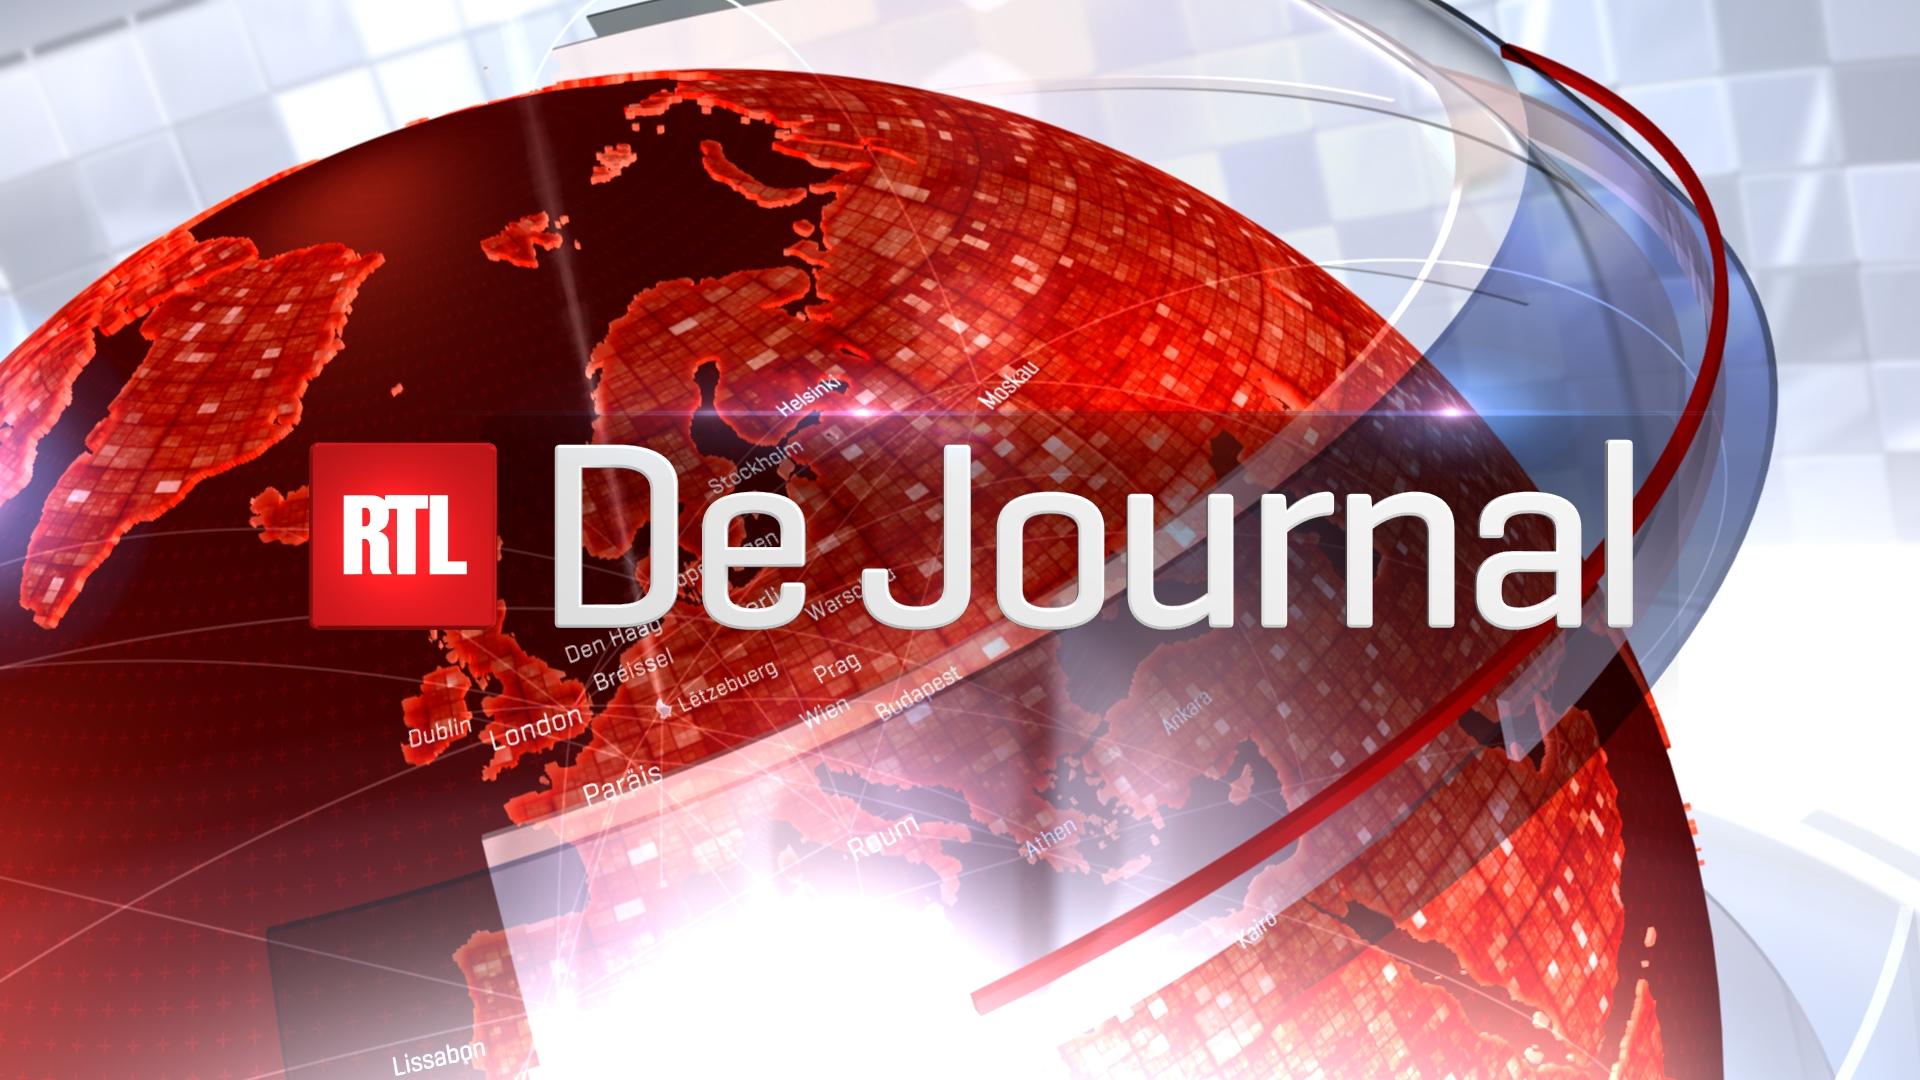 De Journal (R)